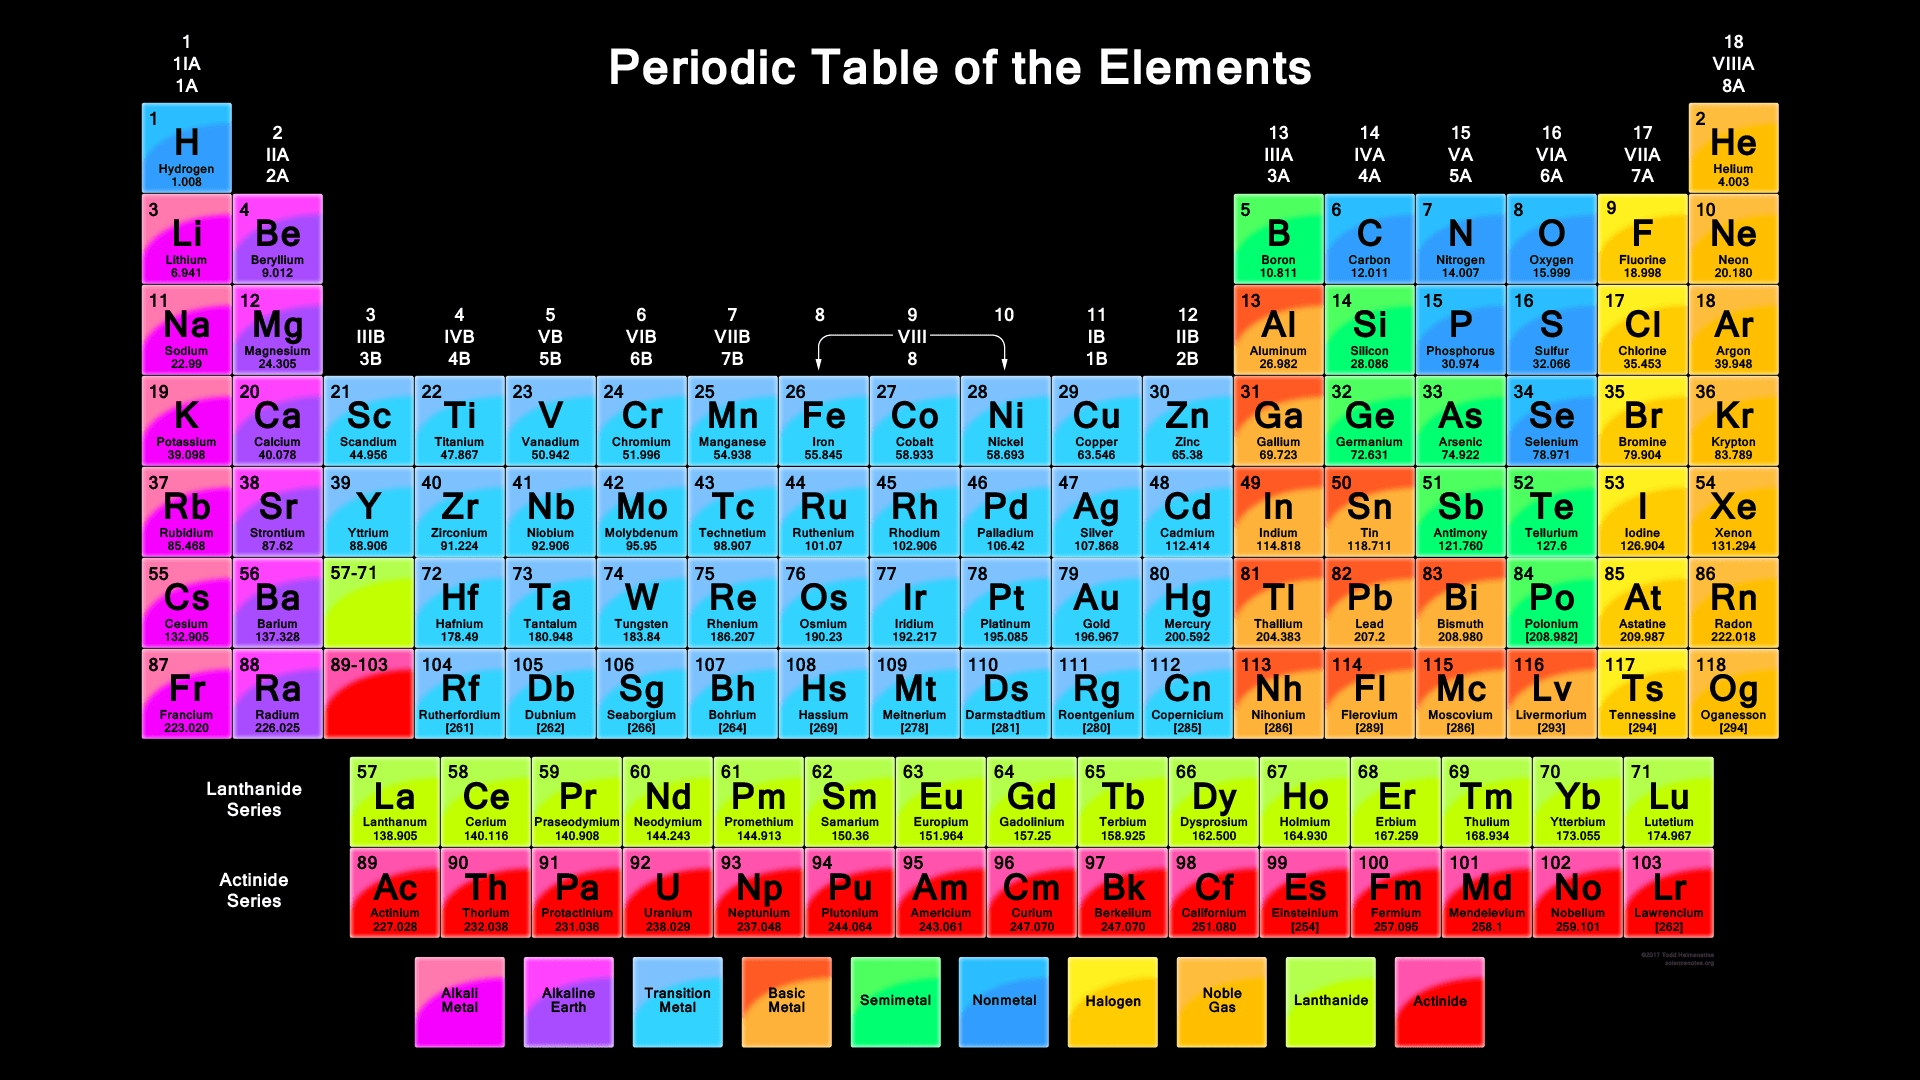 hd wallpaper of periodic table - vibrant color periodic table